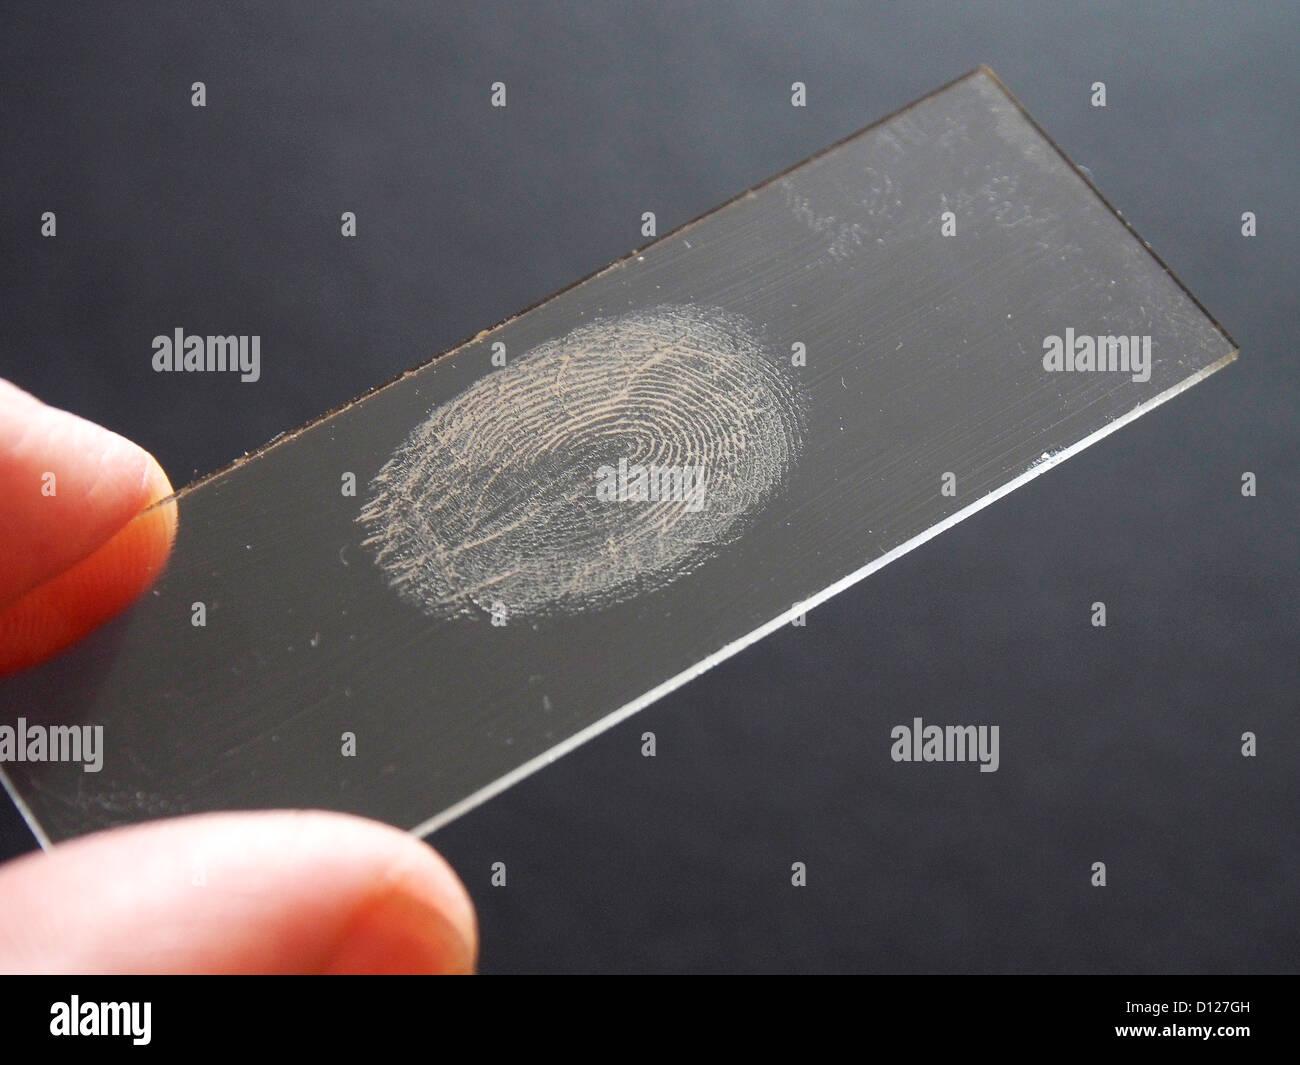 A fingerprint on a glass microscope slide. - Stock Image